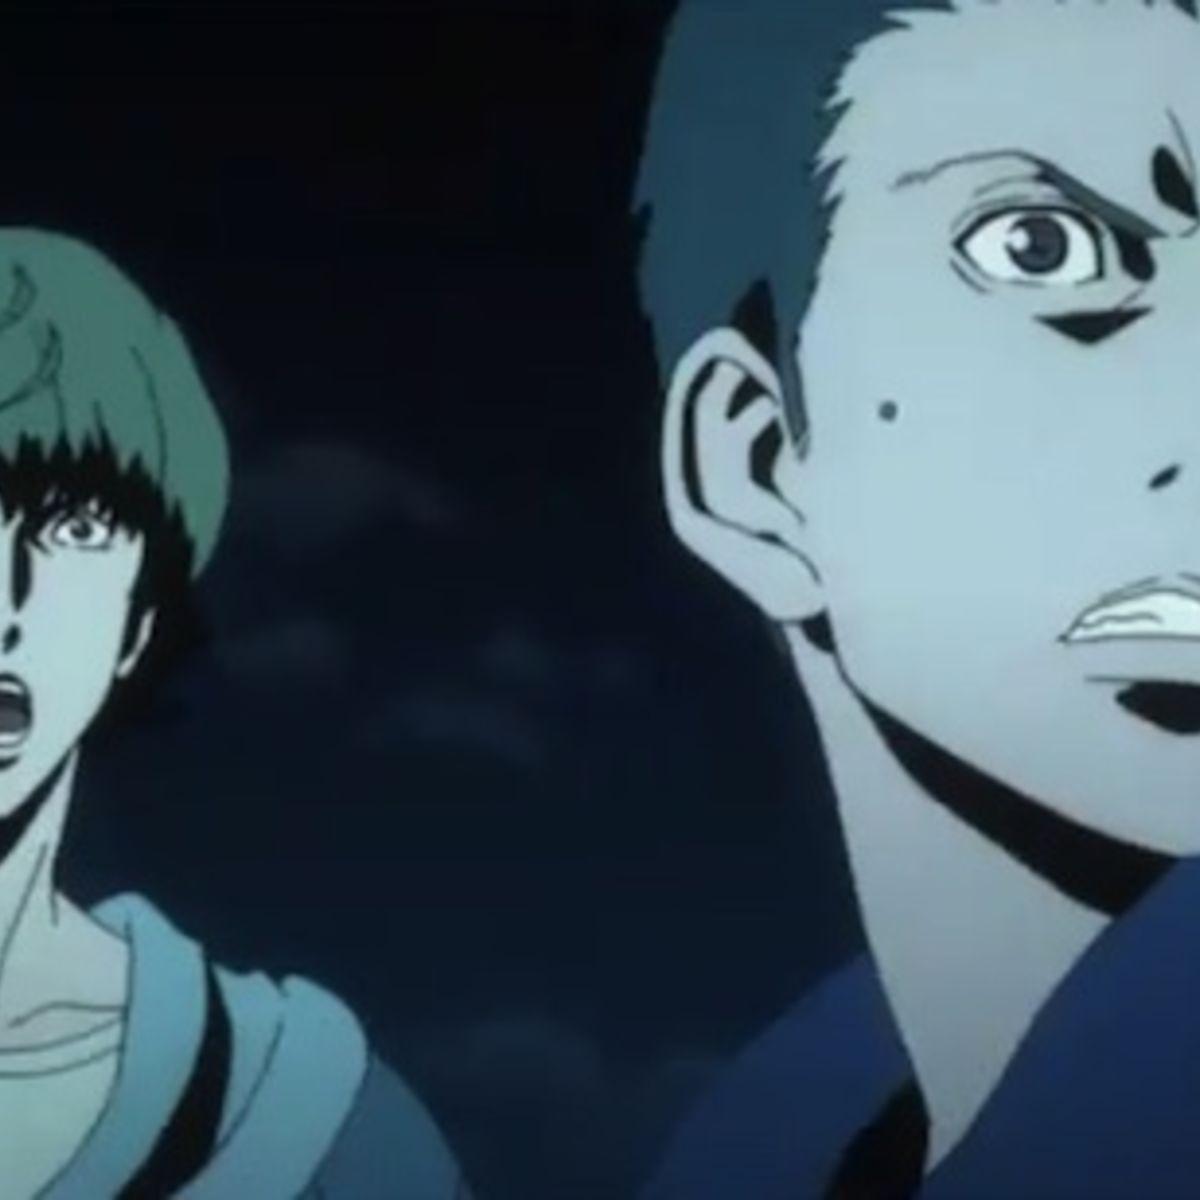 supernatural_anime2.jpg